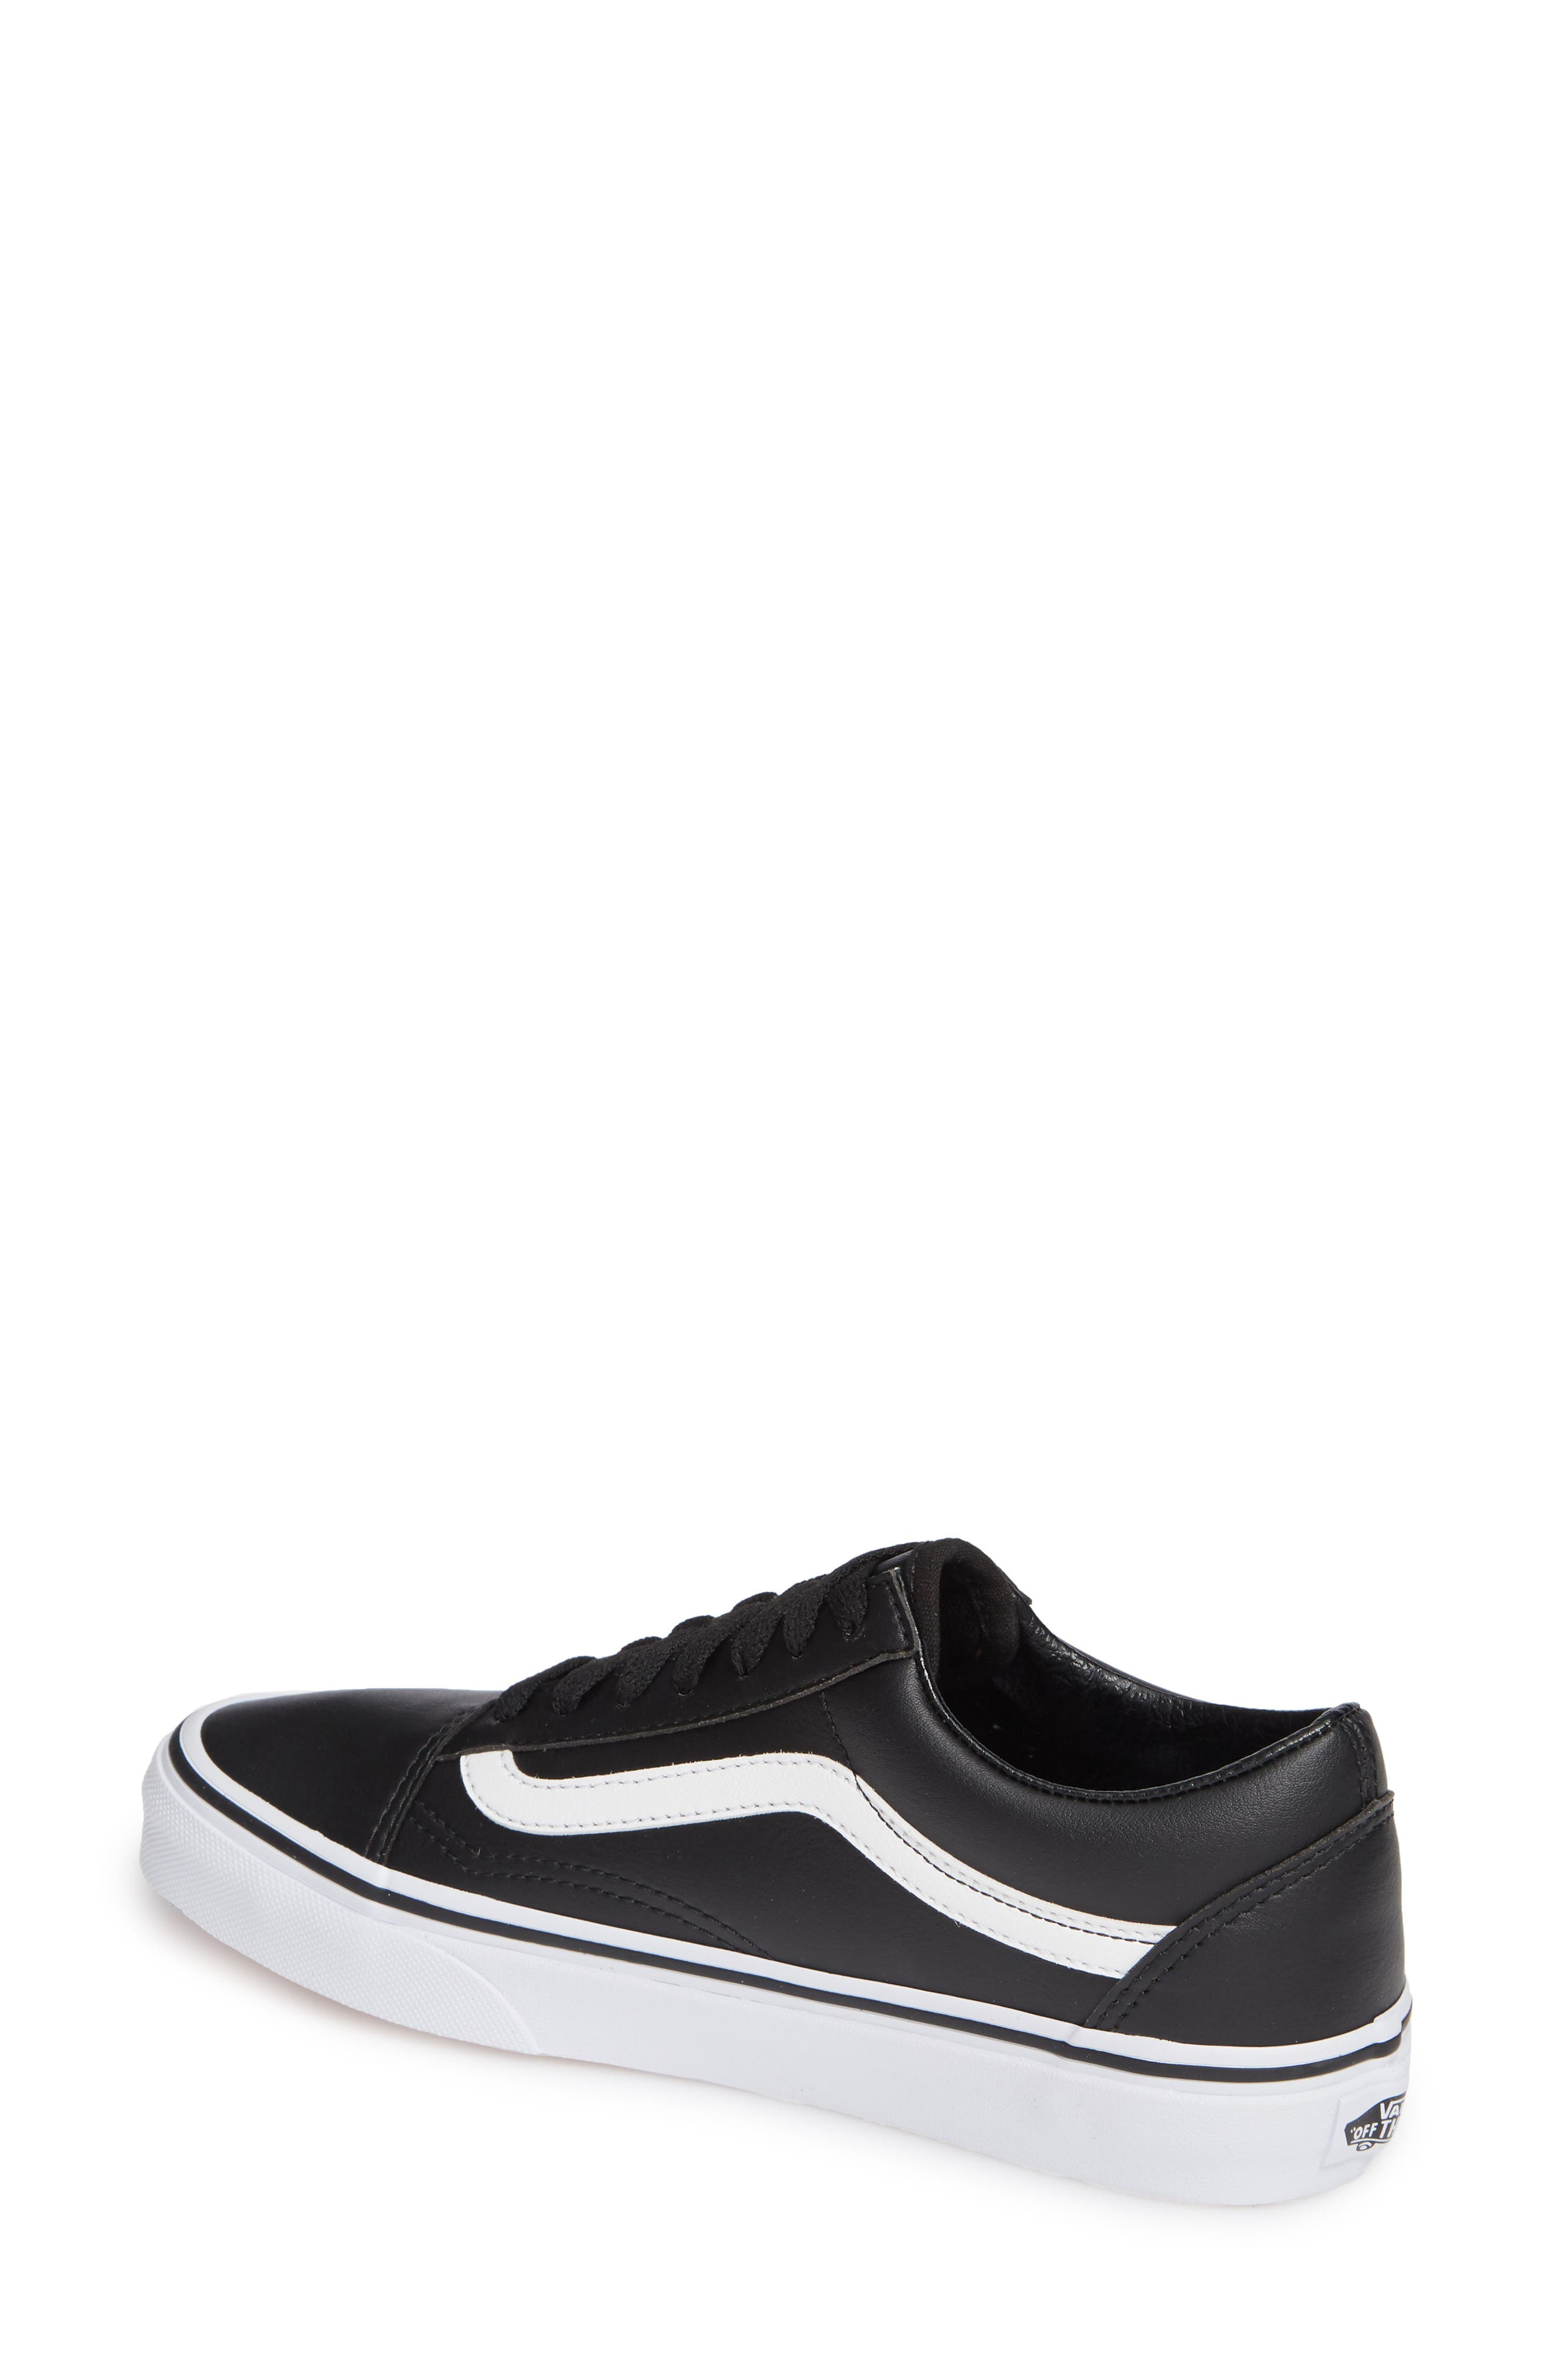 Old Skool Tumble Sneaker,                             Alternate thumbnail 2, color,                             BLACK/ TRUE WHITE